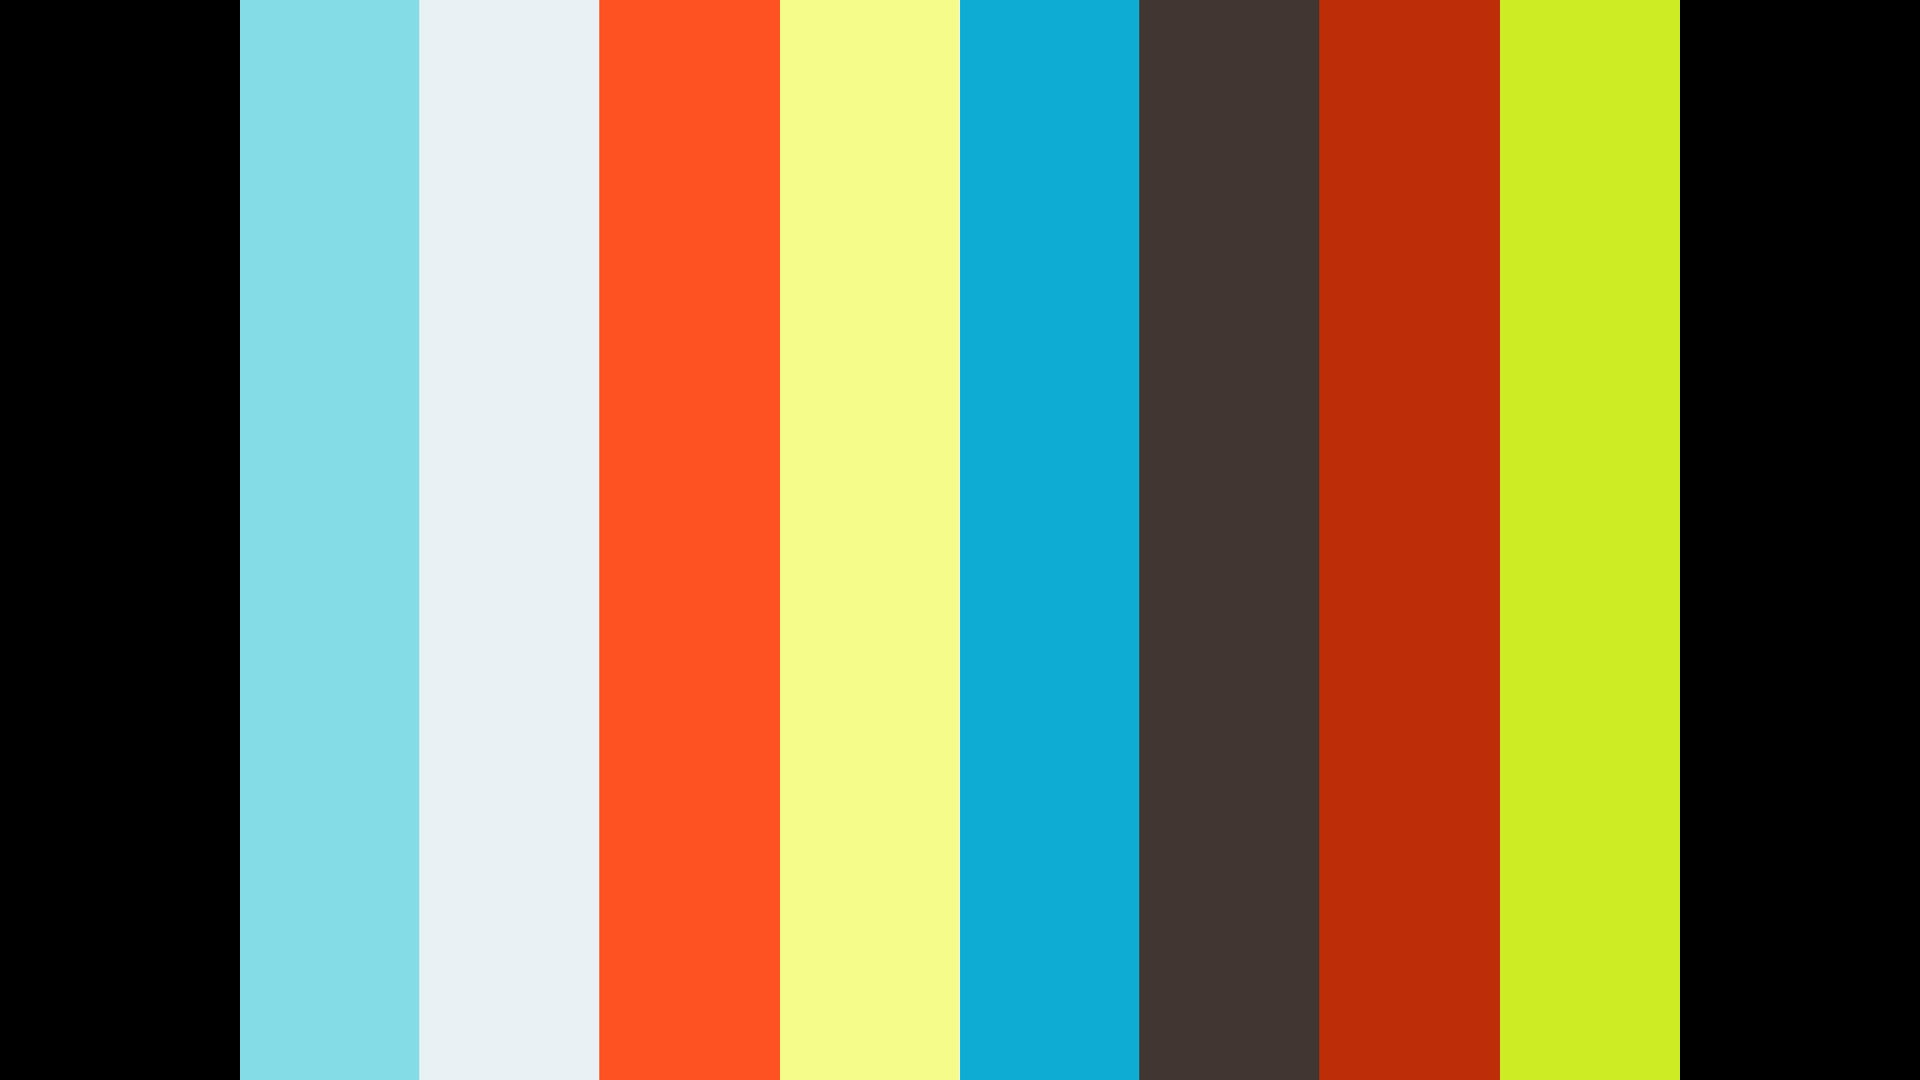 2020-07-14 Ilot Signal - UNDERWATER - NC